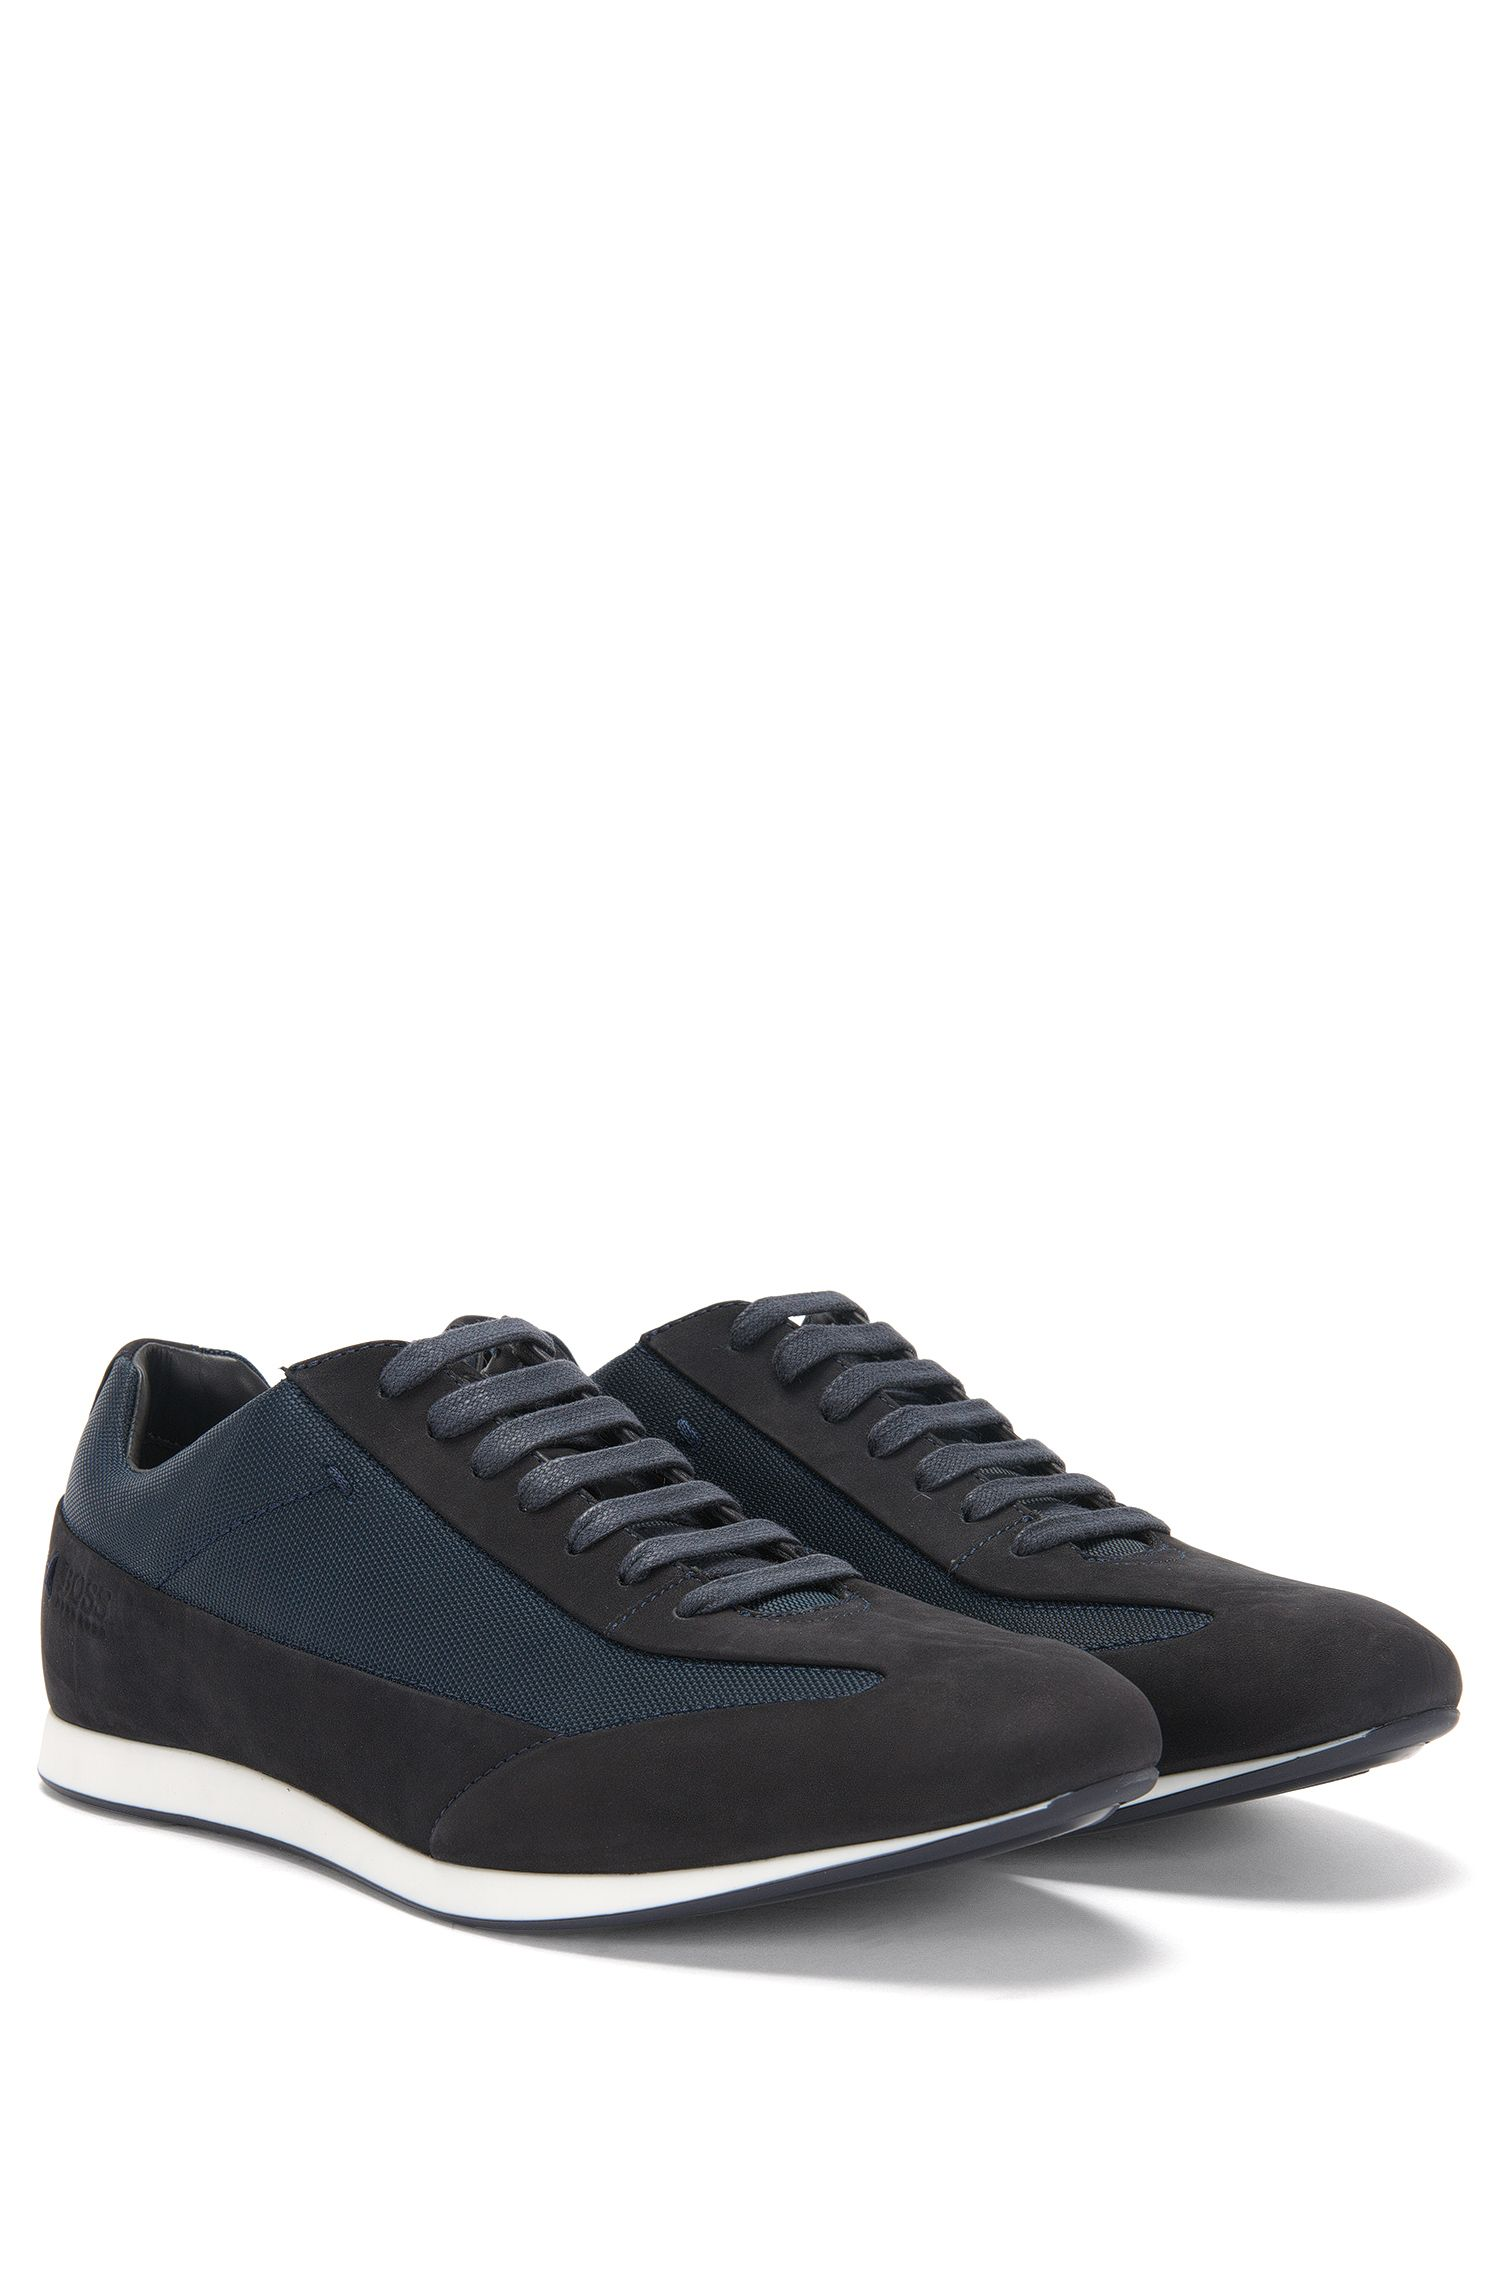 Sneakers aus Leder und Textil: 'Fulltime_Lowp_nuny'